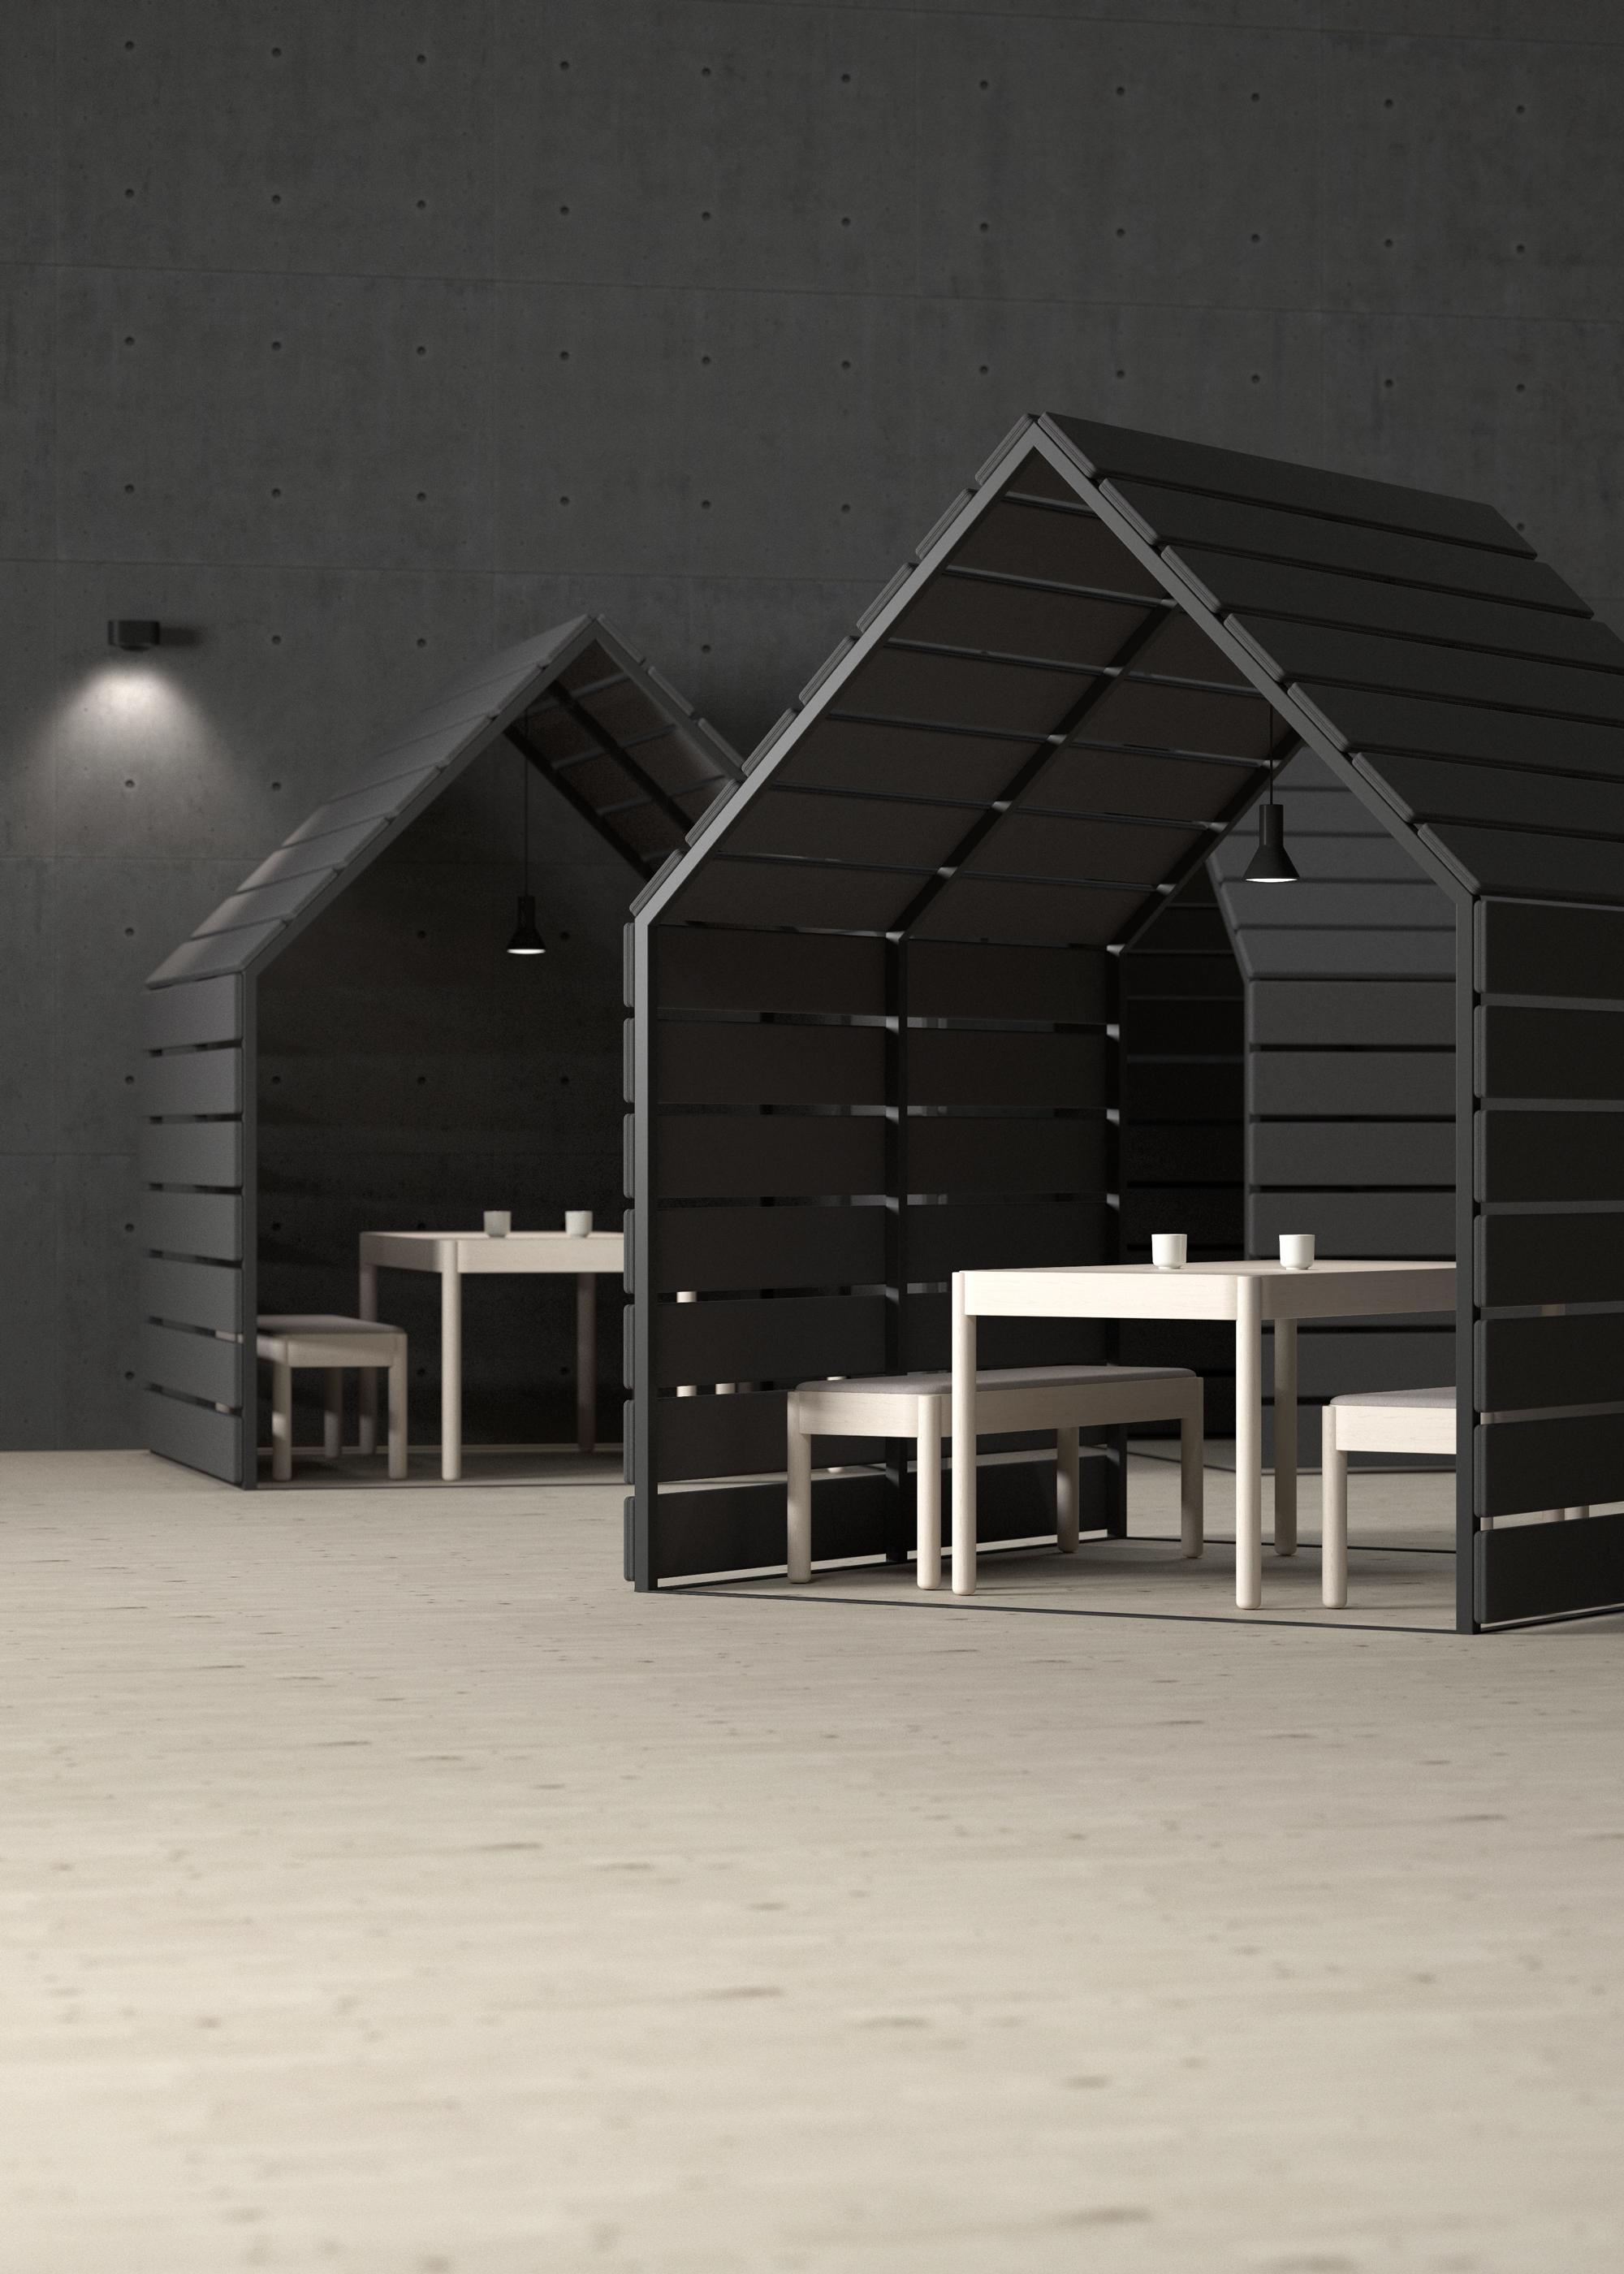 LimbusBarn270_The Barn & Fences_Design Kauppi & Kauppi for Glimakra of Sweden.jpg